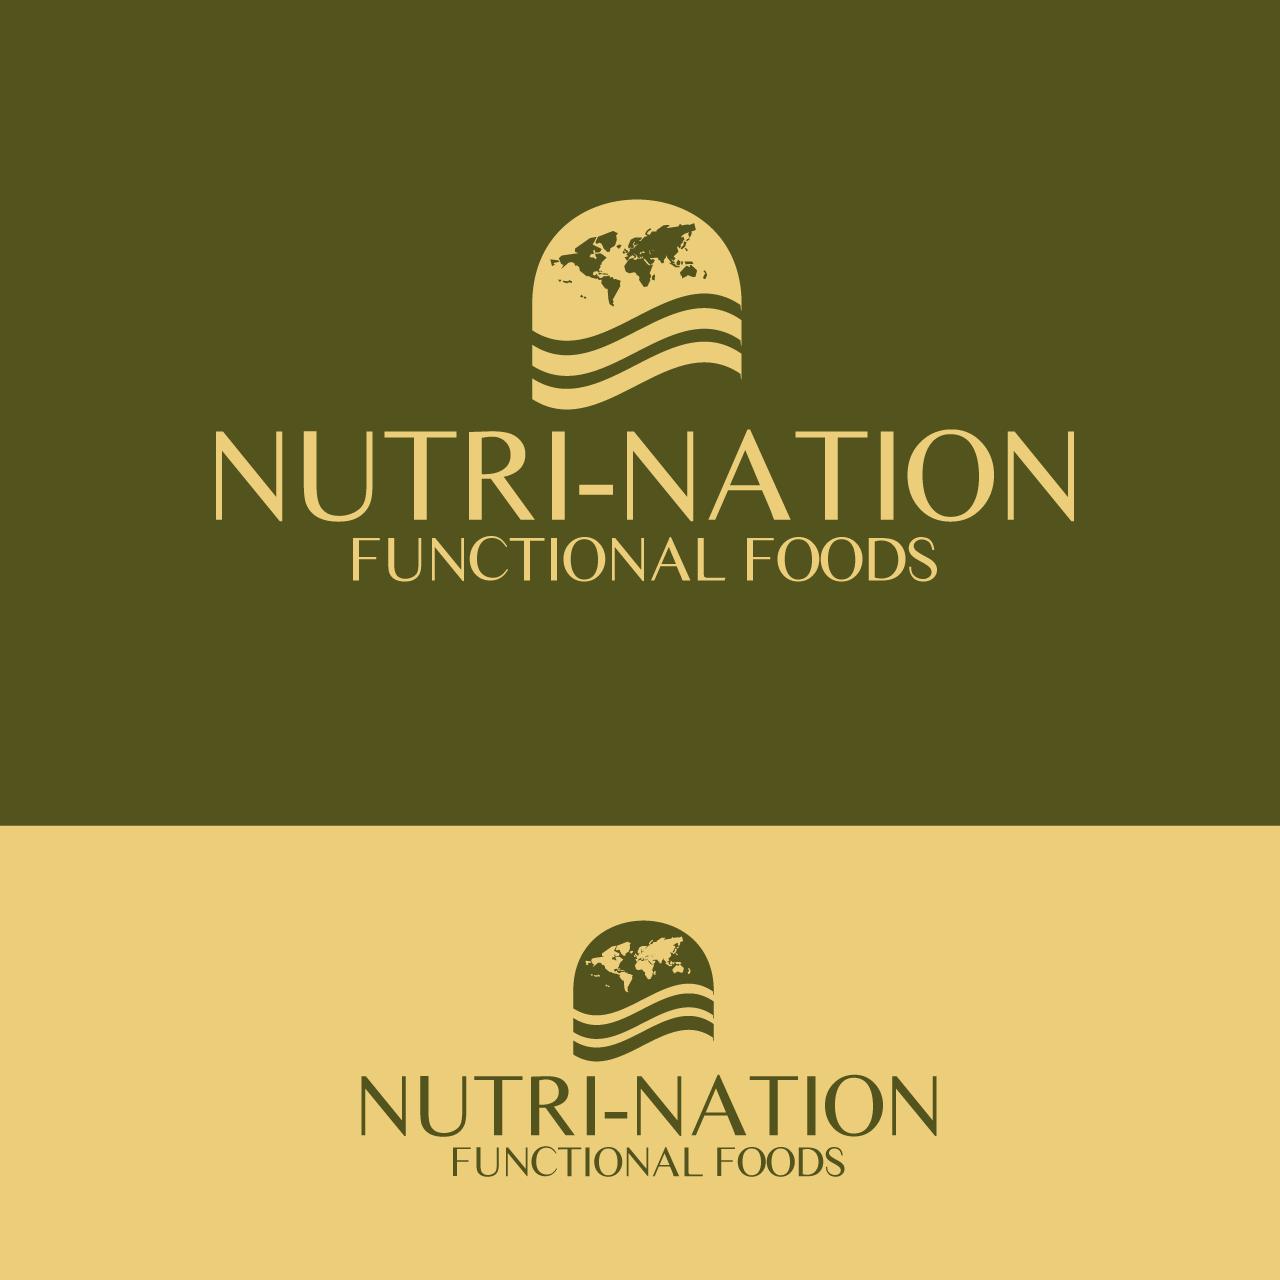 Logo Design by umxca - Entry No. 159 in the Logo Design Contest Nutri-Nation Functional Foods Logo.